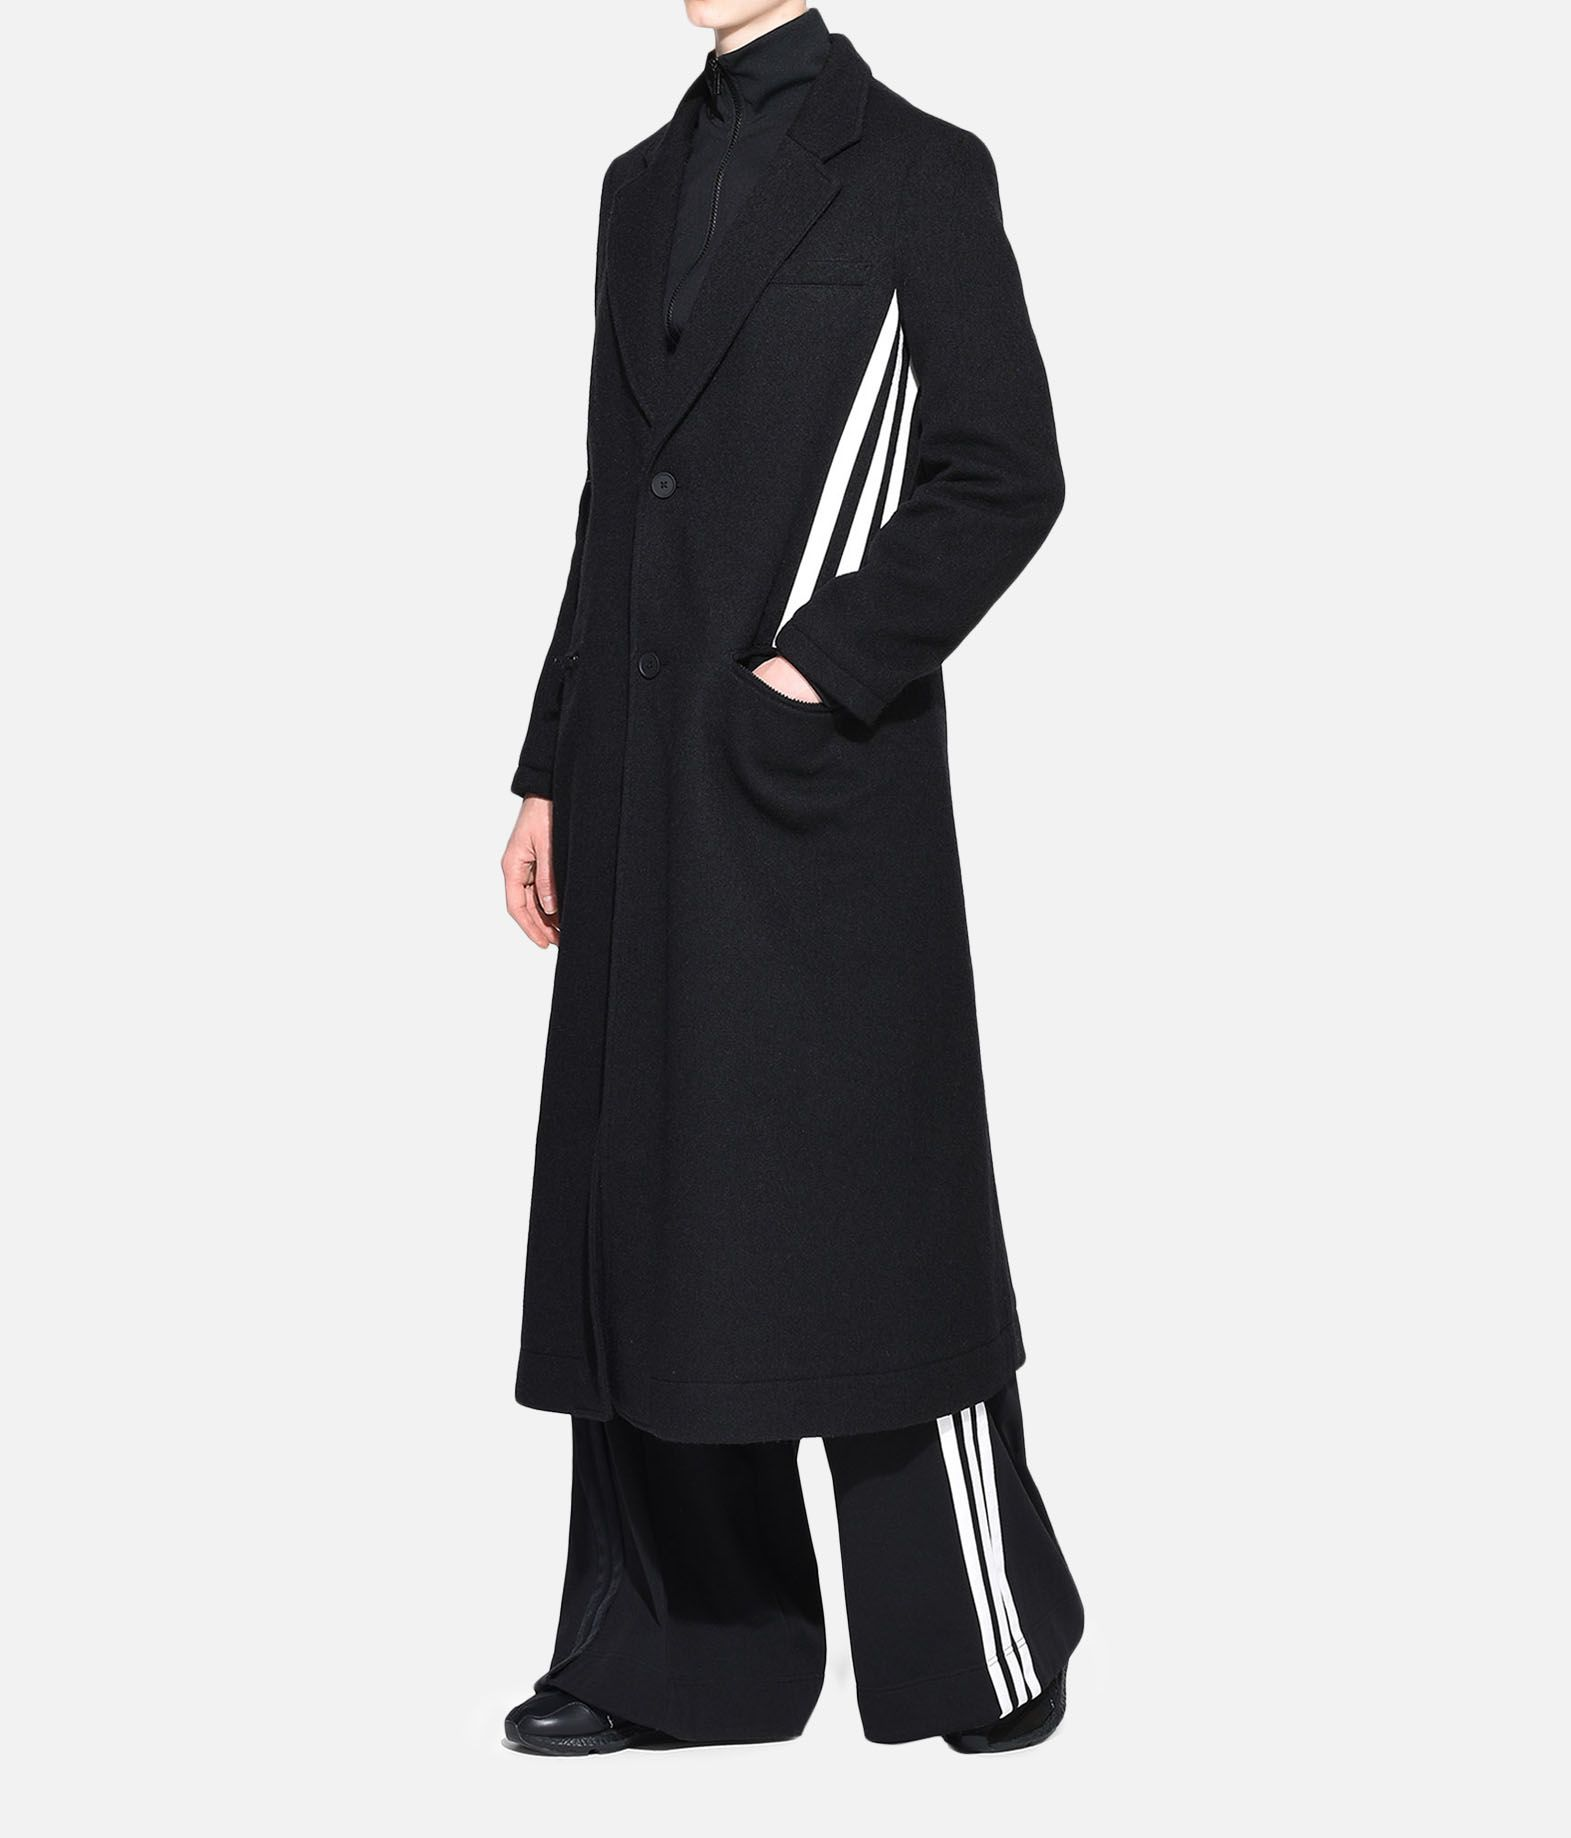 Y-3 Y-3 3-Stripes Tailored Wool Coat Blazer Damen a